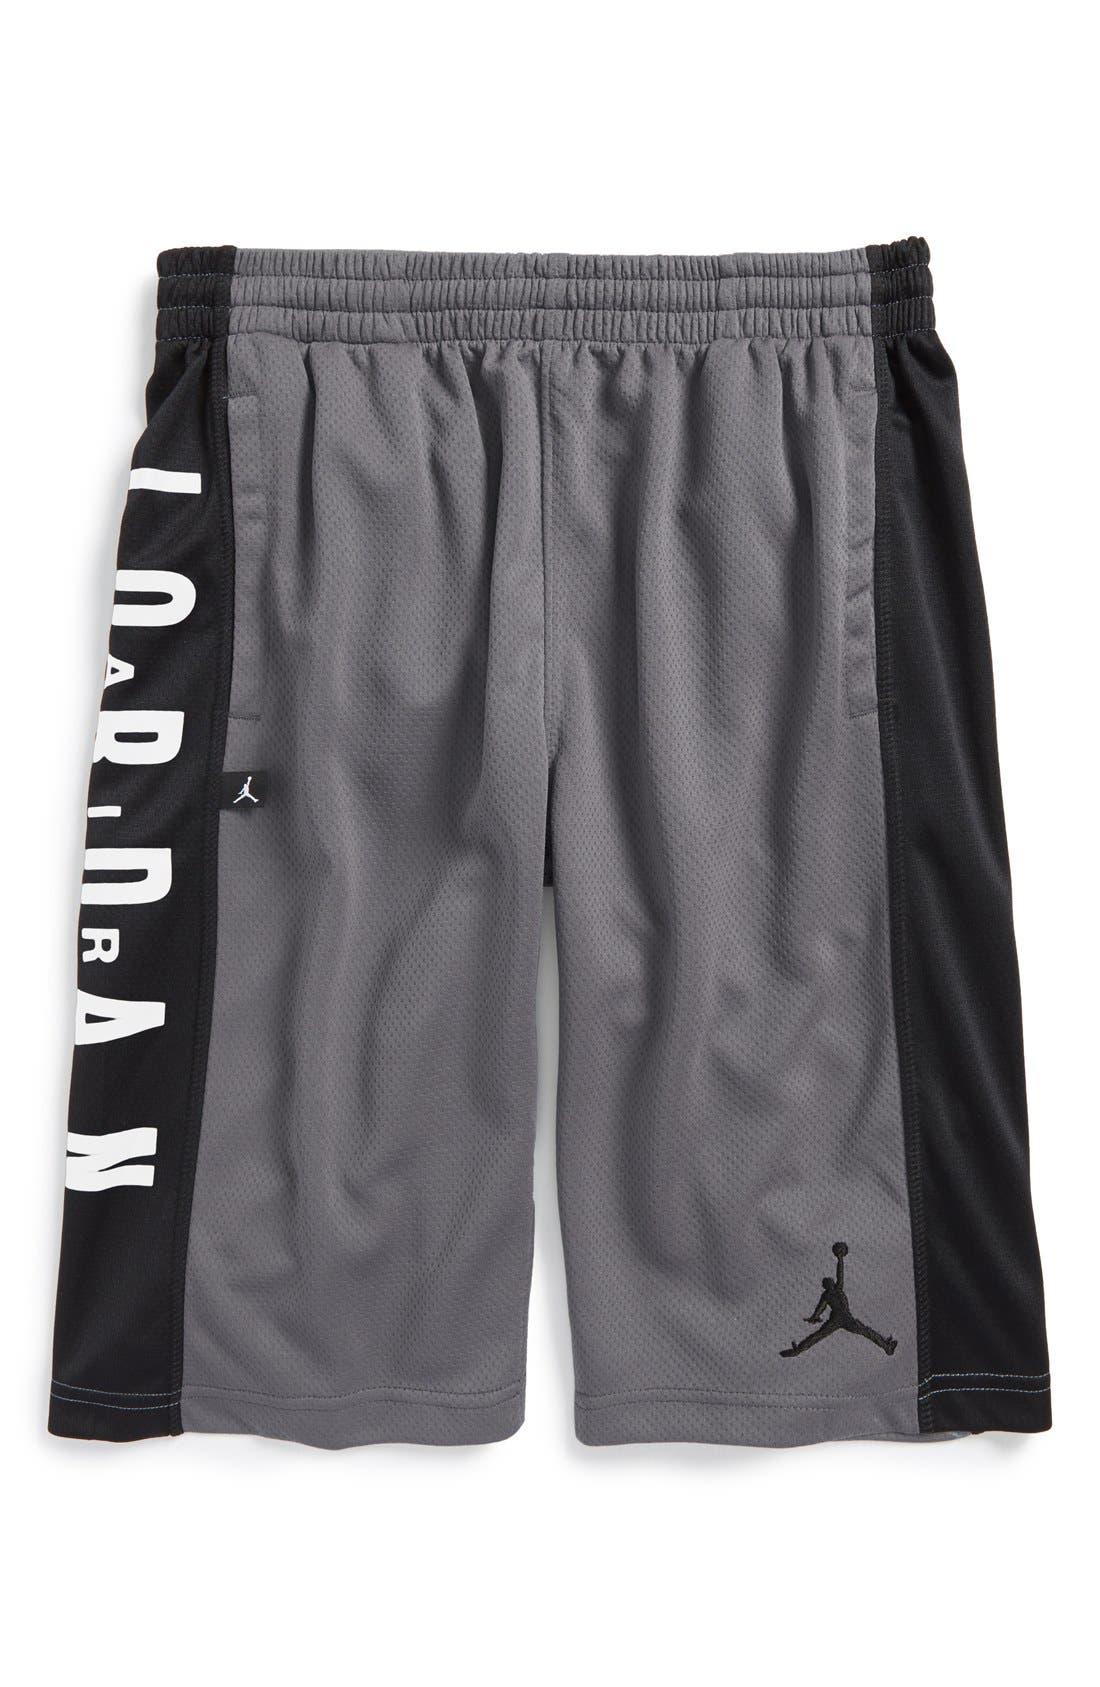 Alternate Image 1 Selected - Jordan 'Highlight' Basketball Shorts (Big Boys)